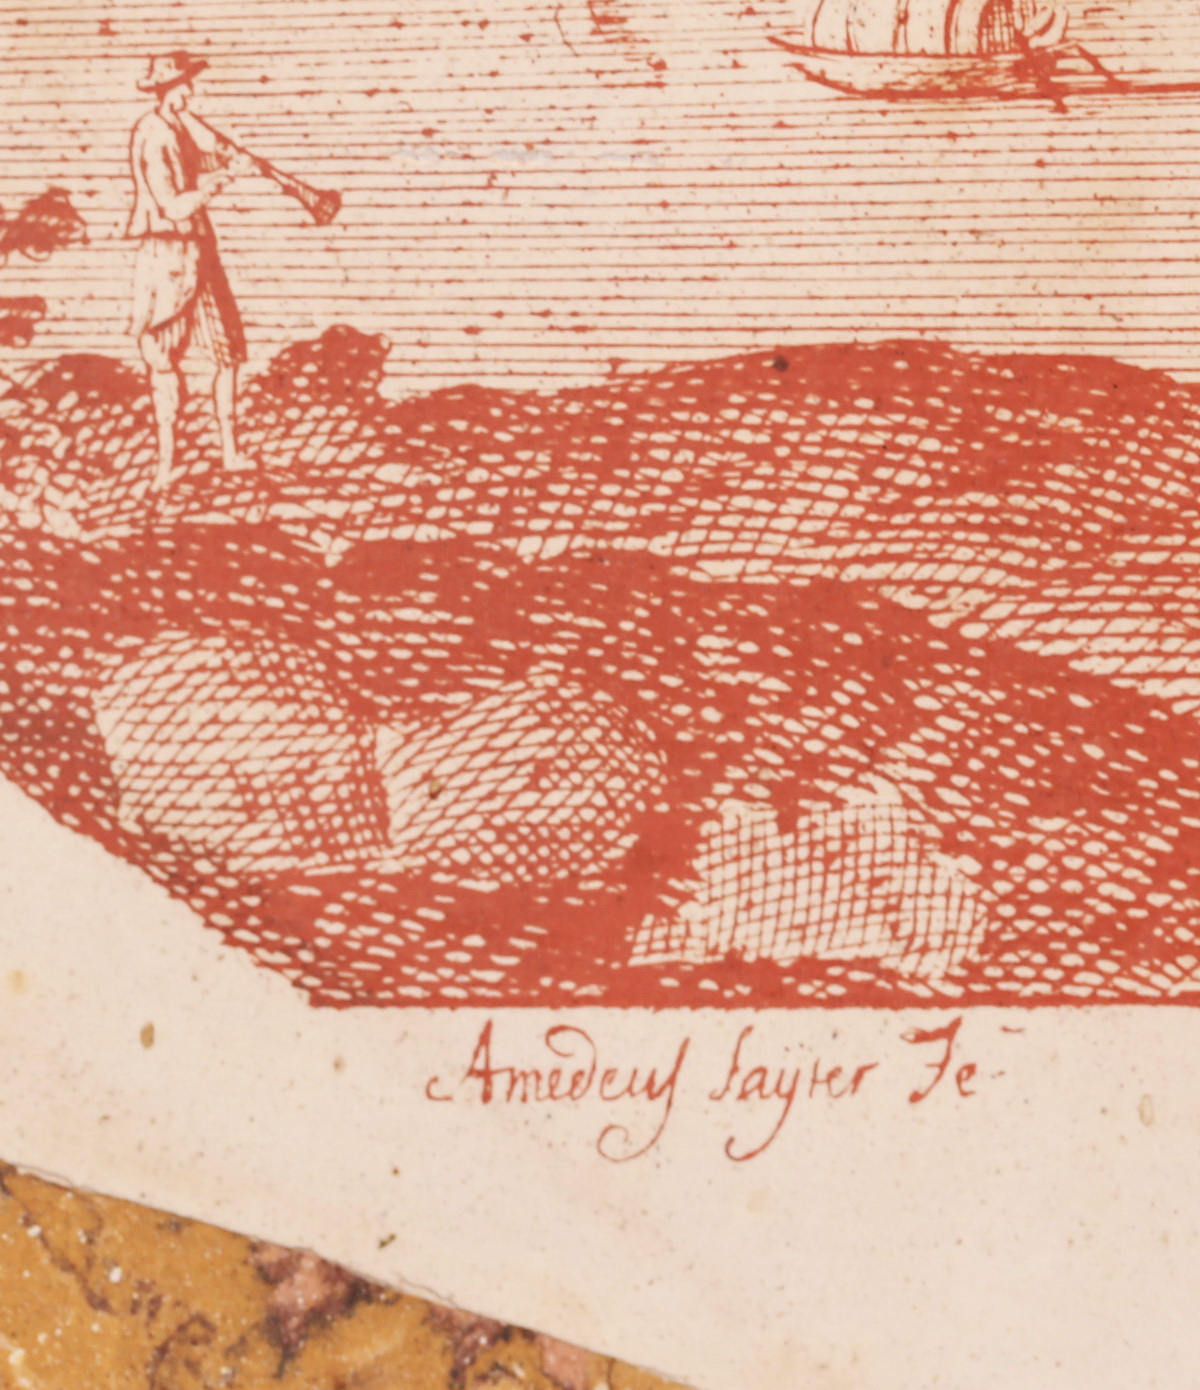 Amedeus SAYTER Fecit  circa 1720